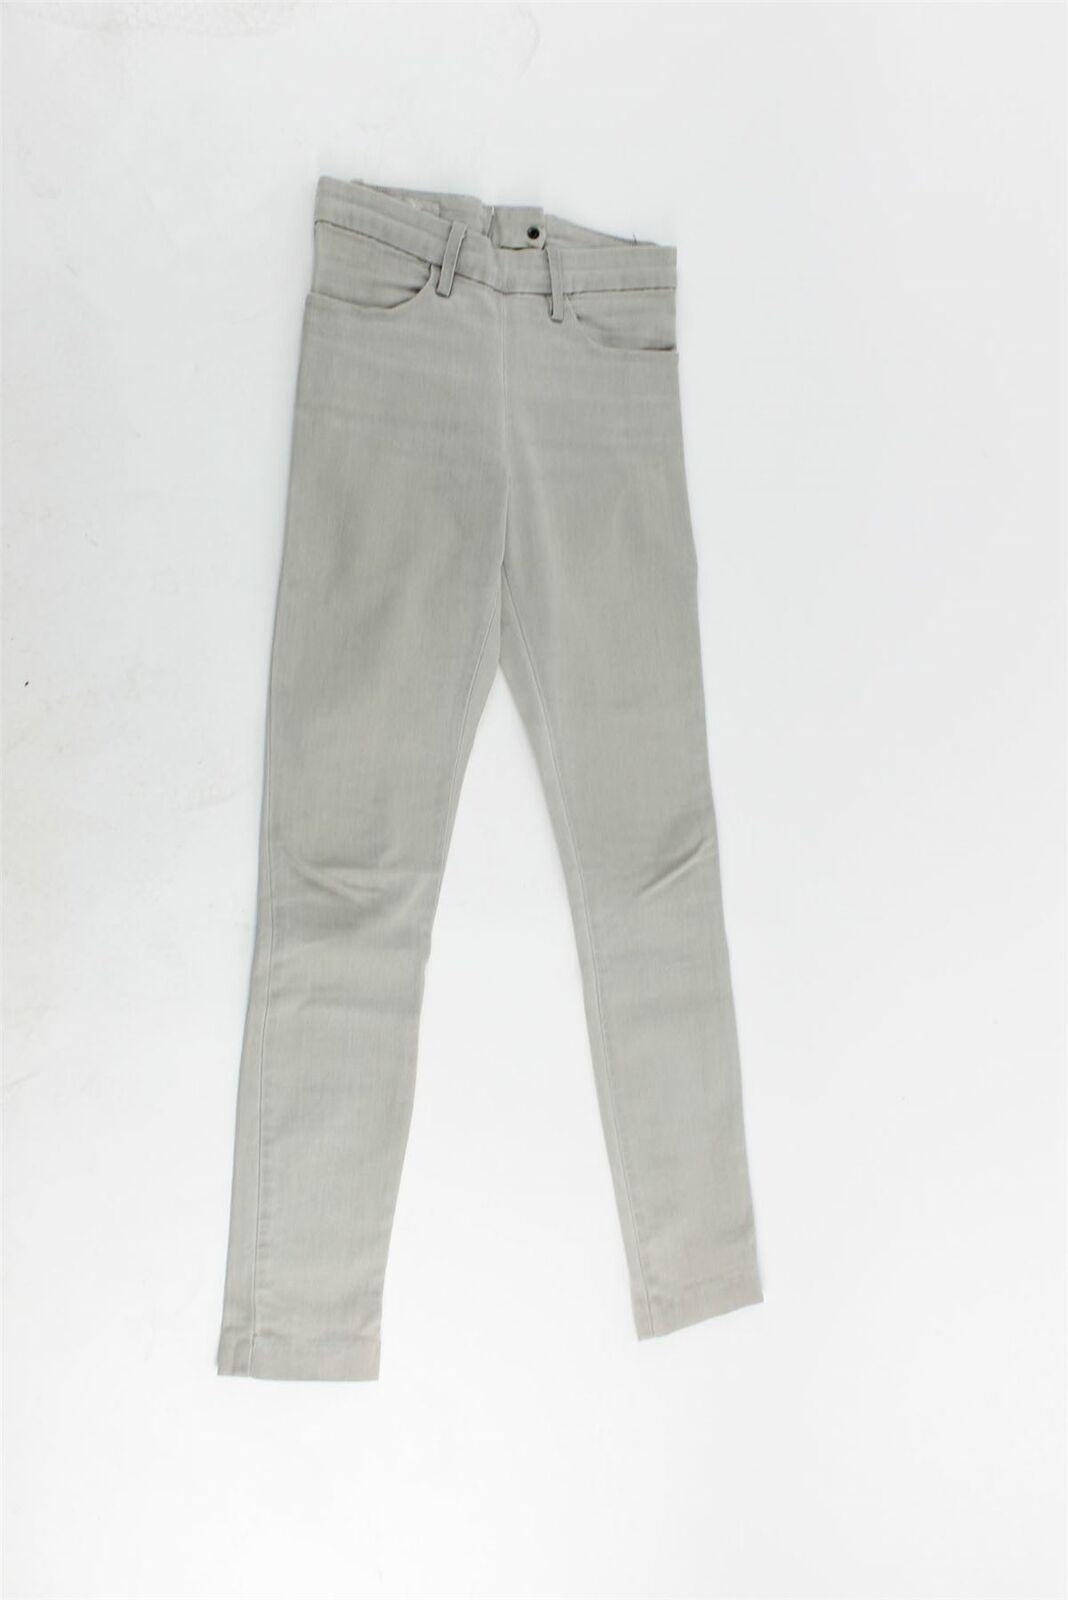 Acne Skin grau Cotton Blend High-Rise Jeans, UK 8 US 4 EU 36